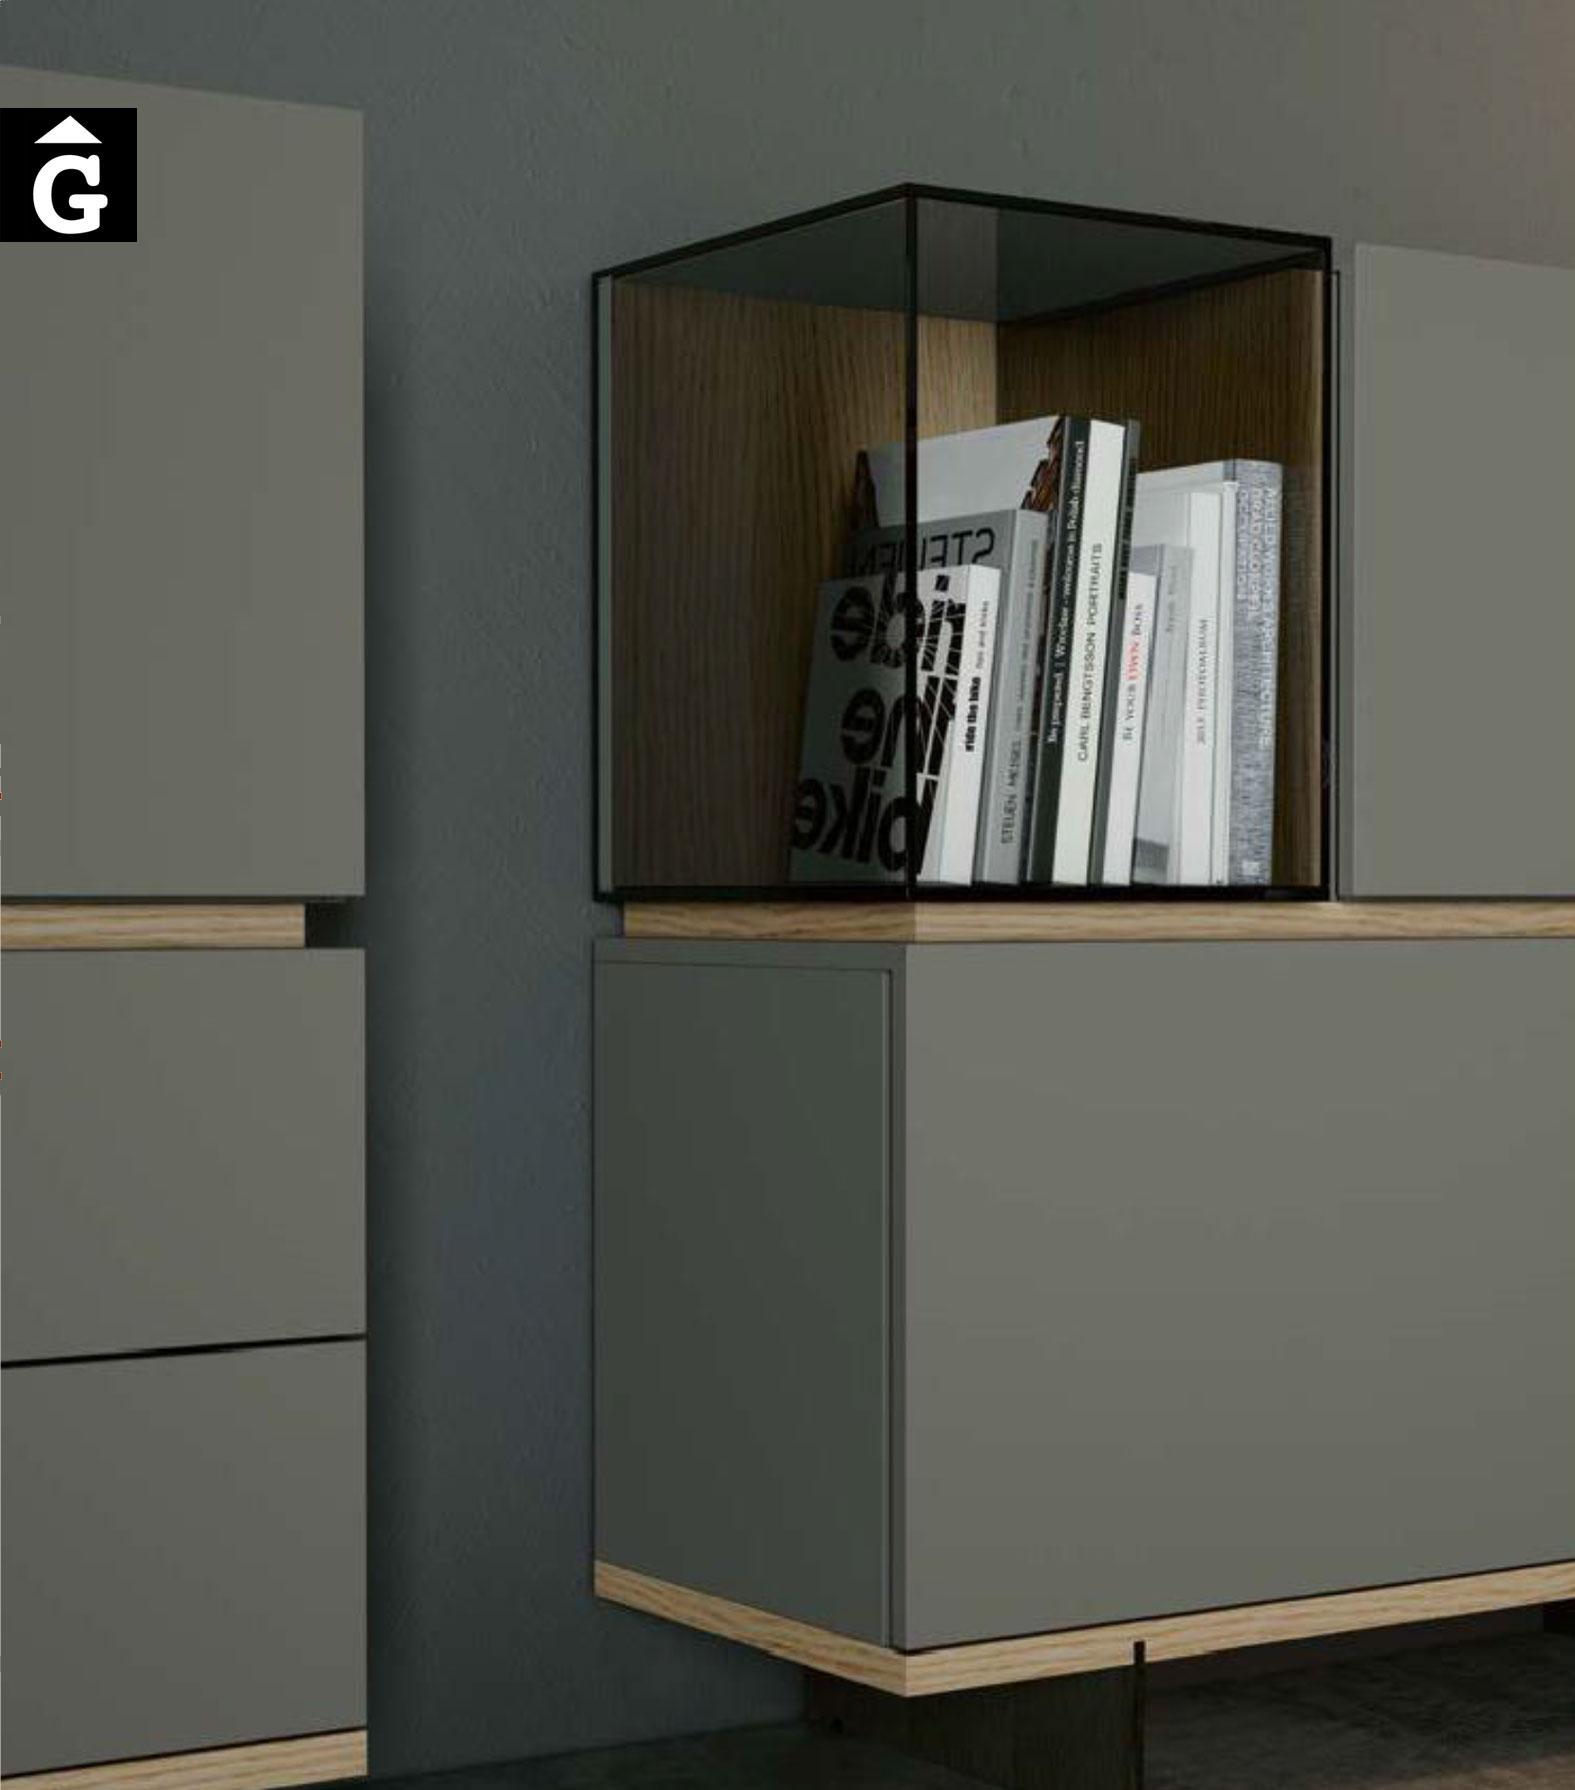 MOBLE-32-0-V-CONNECTOR-EMEDE-mobles-by-Mobles-GIFREU-Girona-ESPAI-EMEDE-Epacio-emede-Muebles-MD-moble-menjador-Sala-estar-habitatge-qualitat-laca-xapa-natural